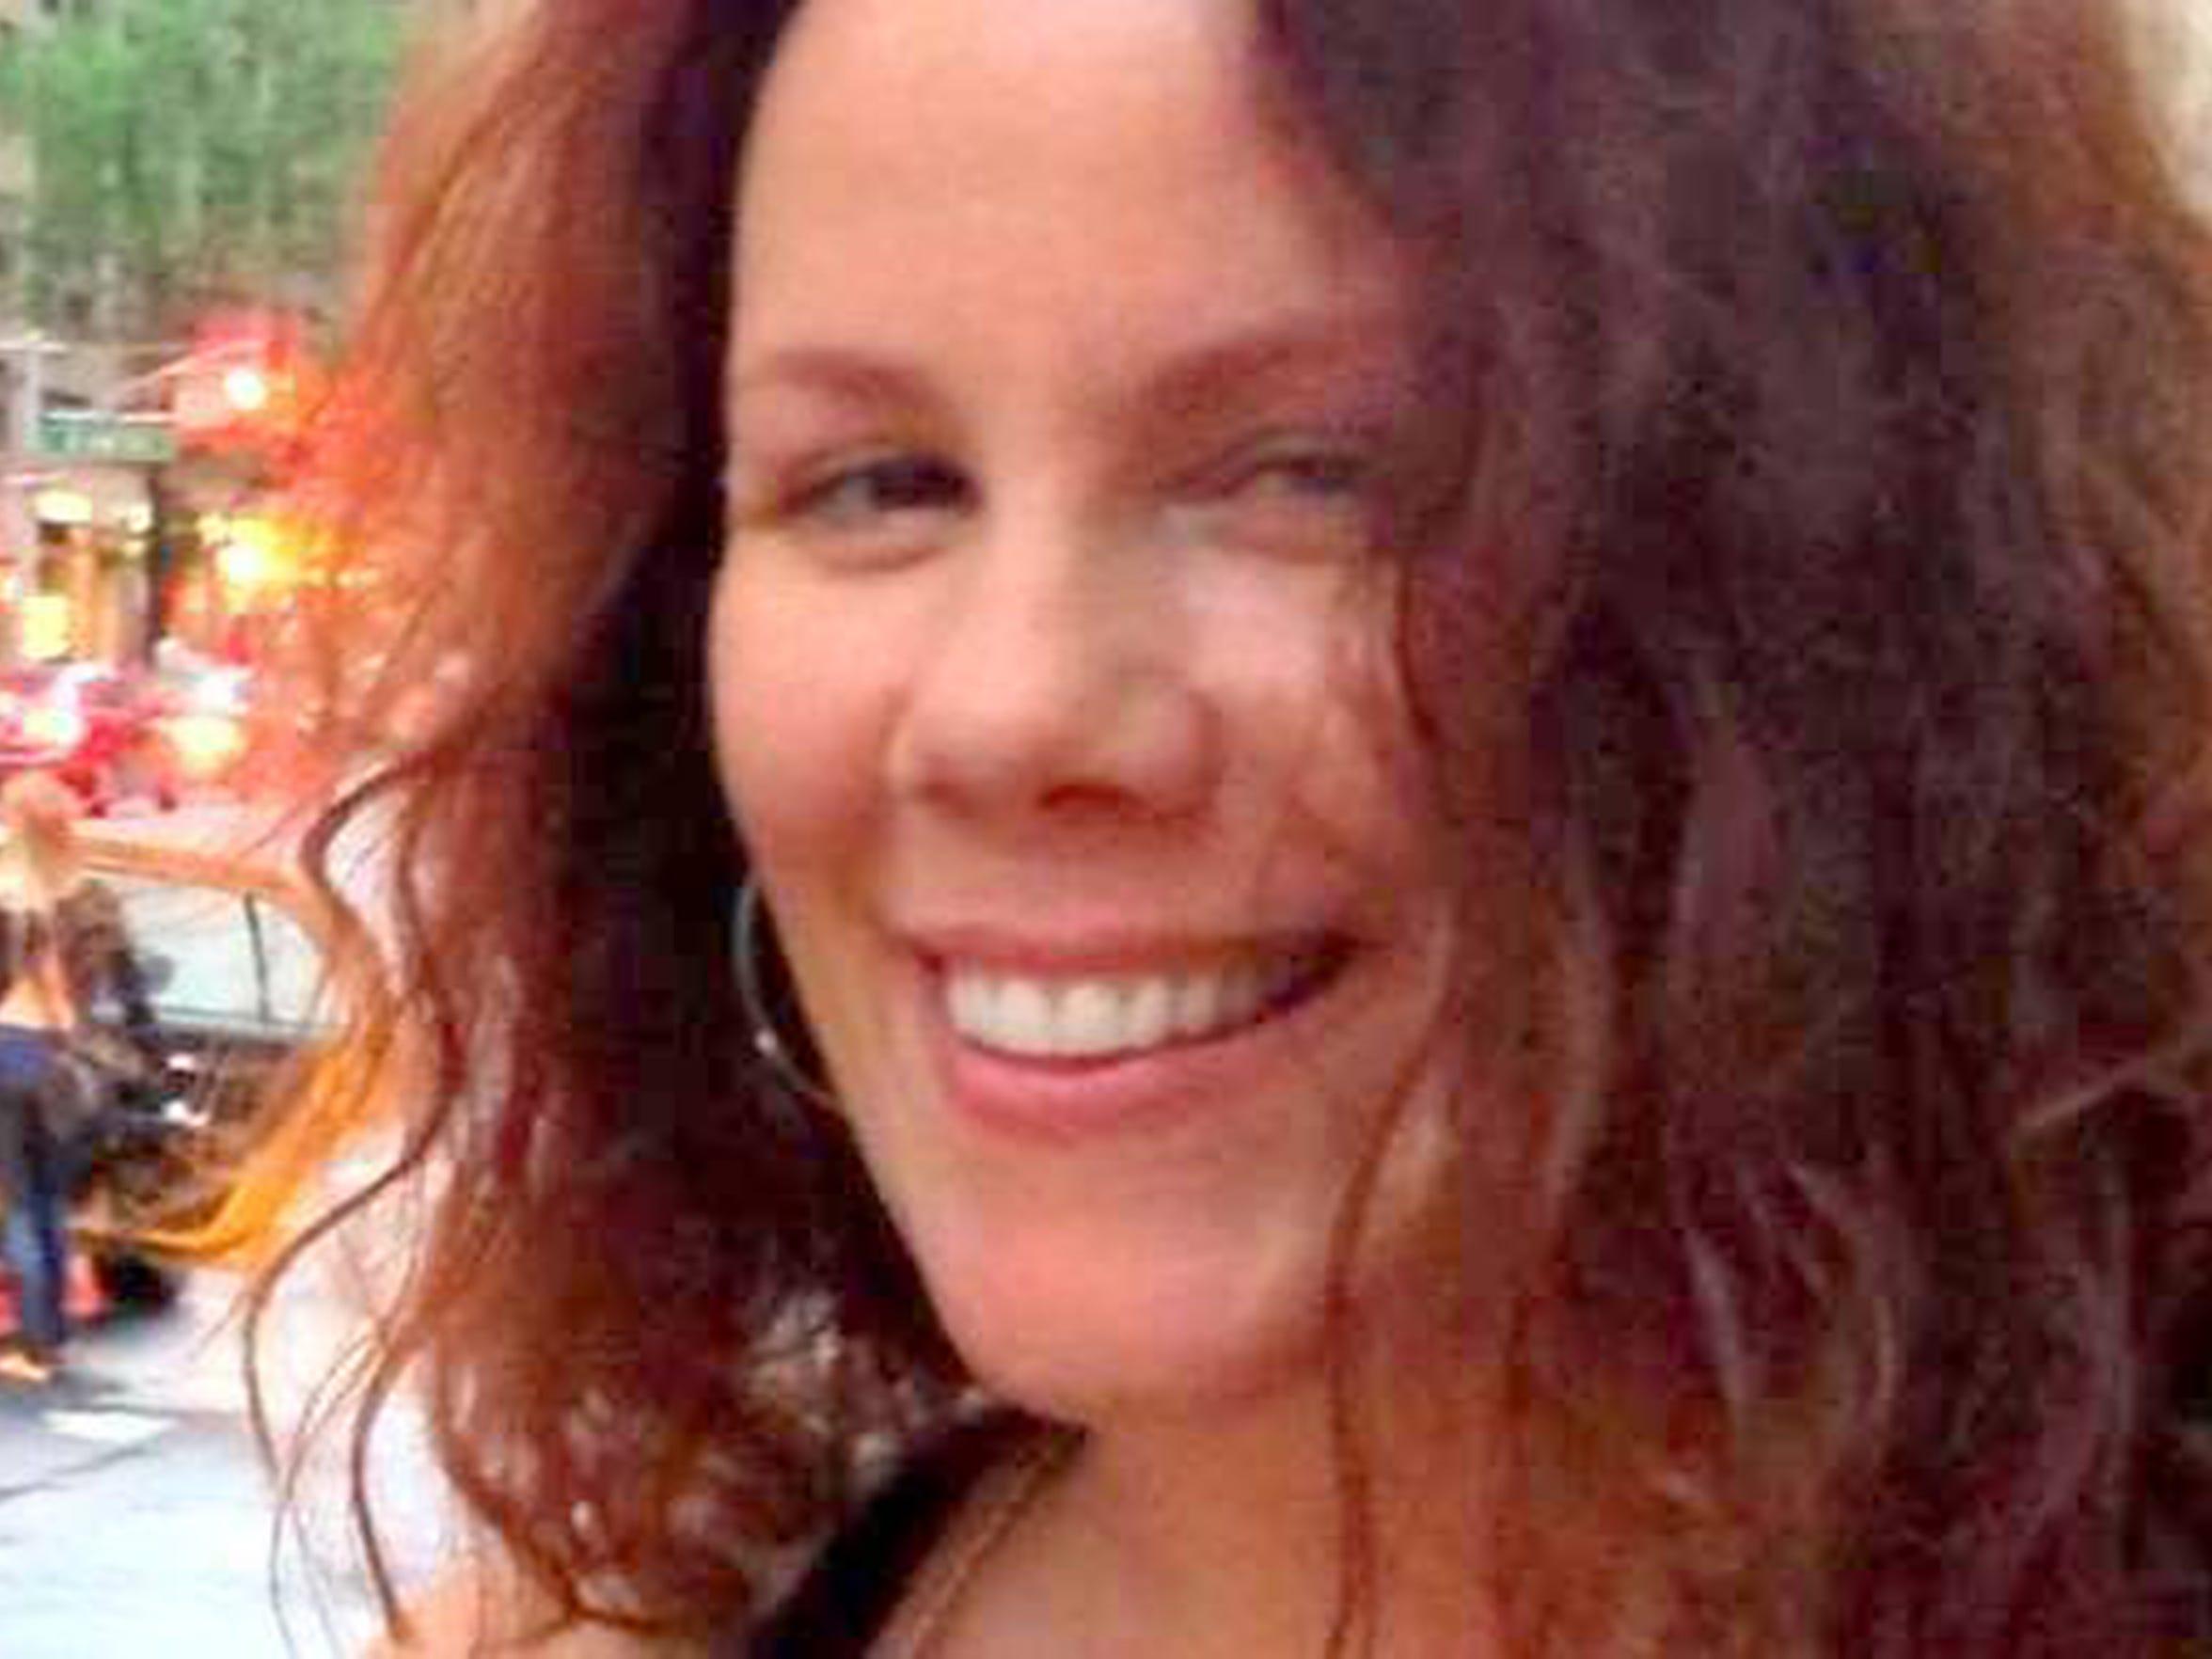 Shannon Harrington lives with Lyme disease.